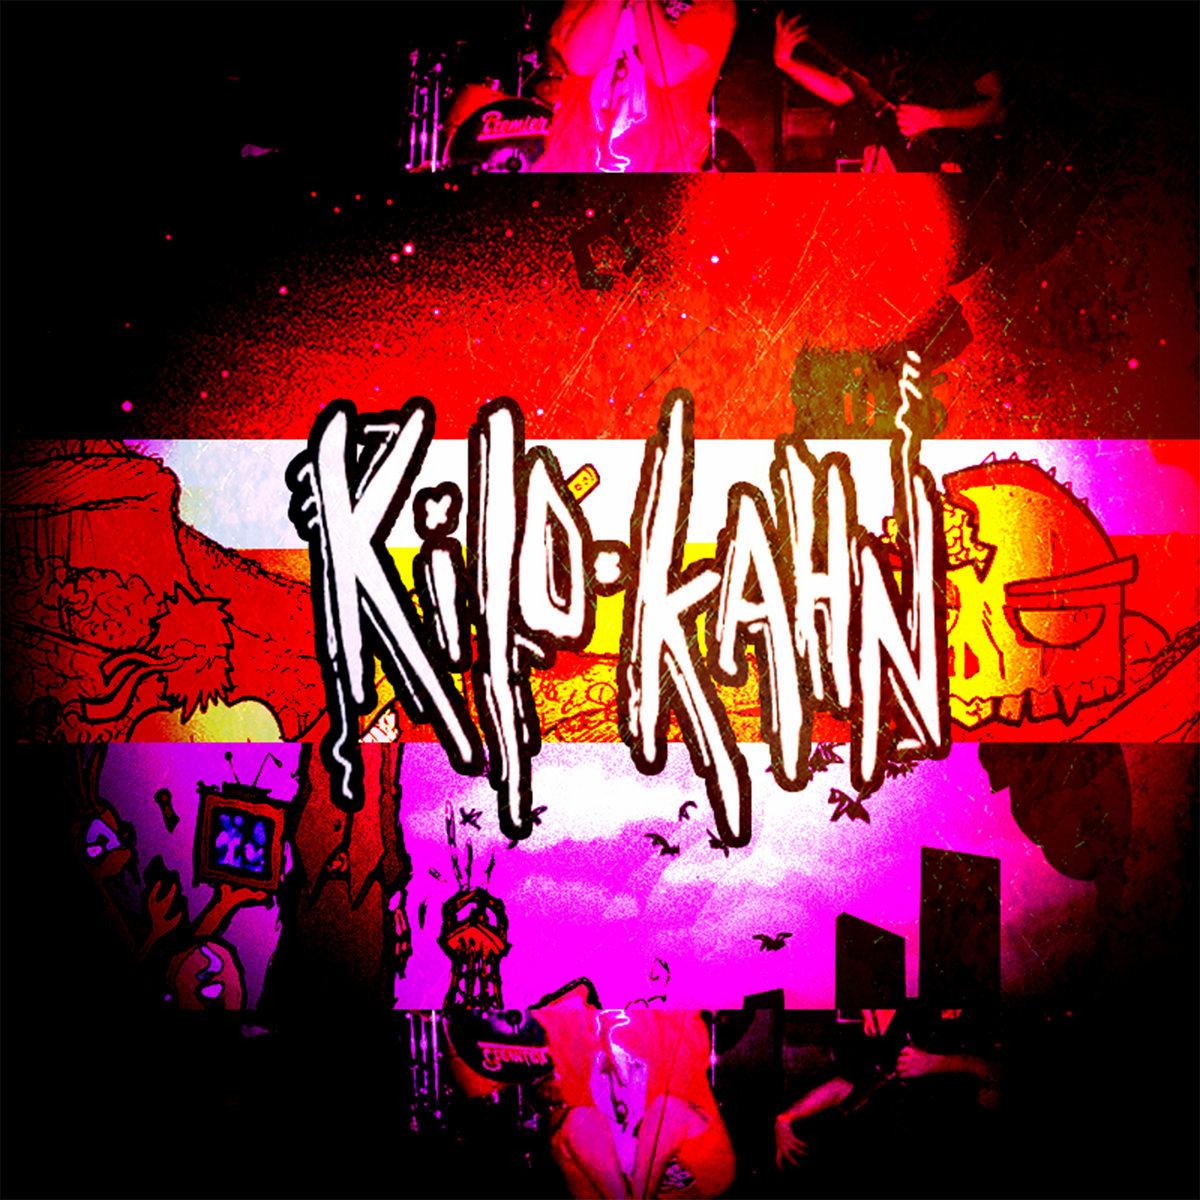 Kilo-Kahn - Kilo-Kahn (2016)